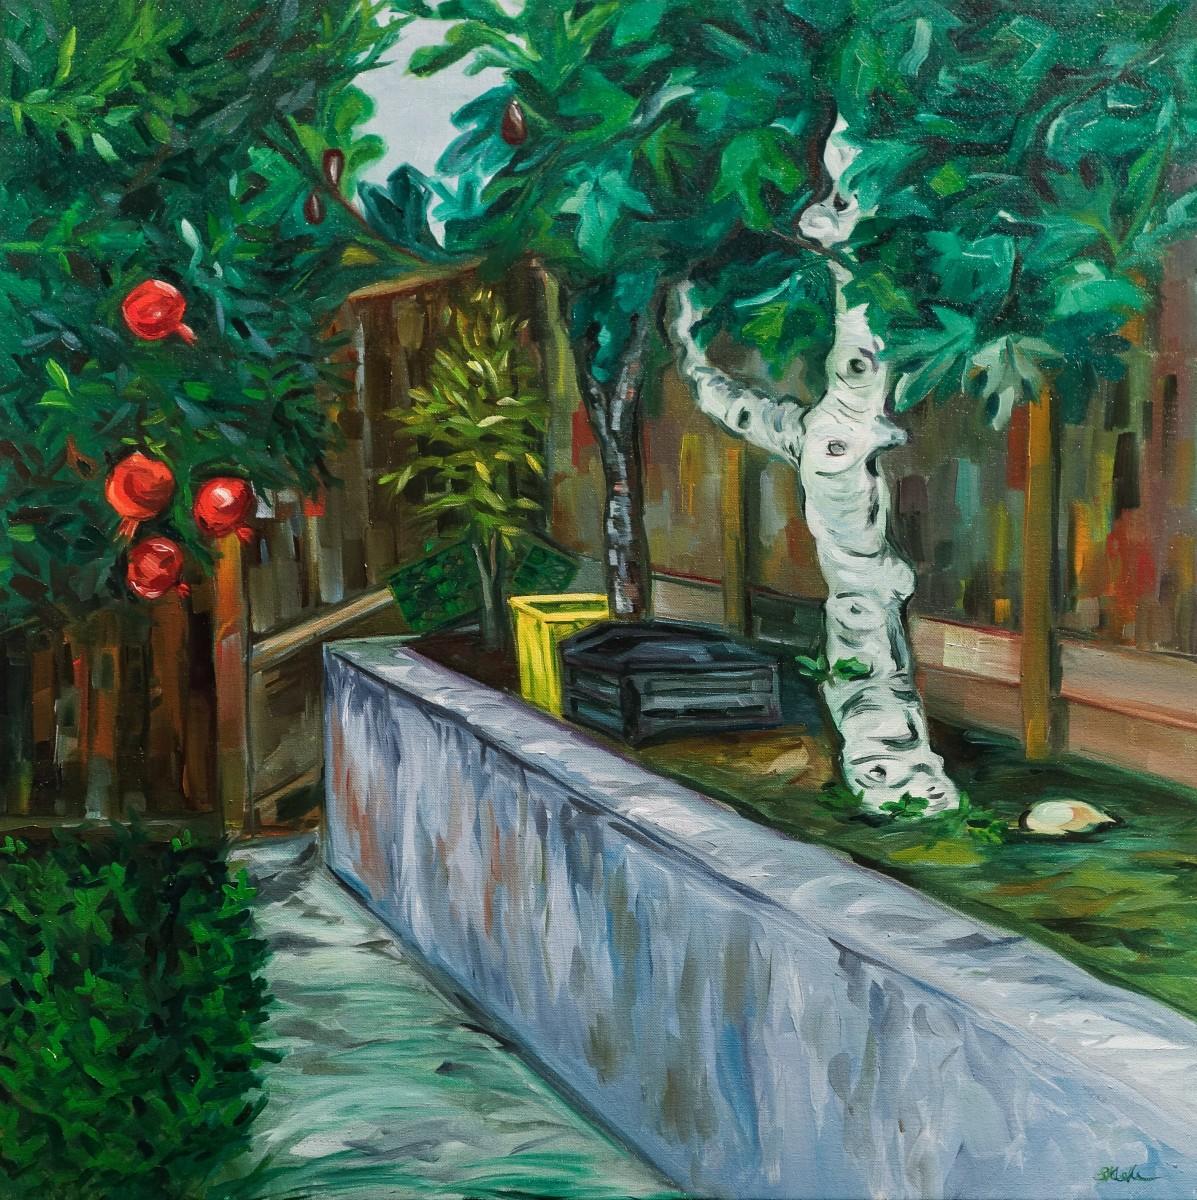 Garden with Fig Tree by Sonya Kleshik